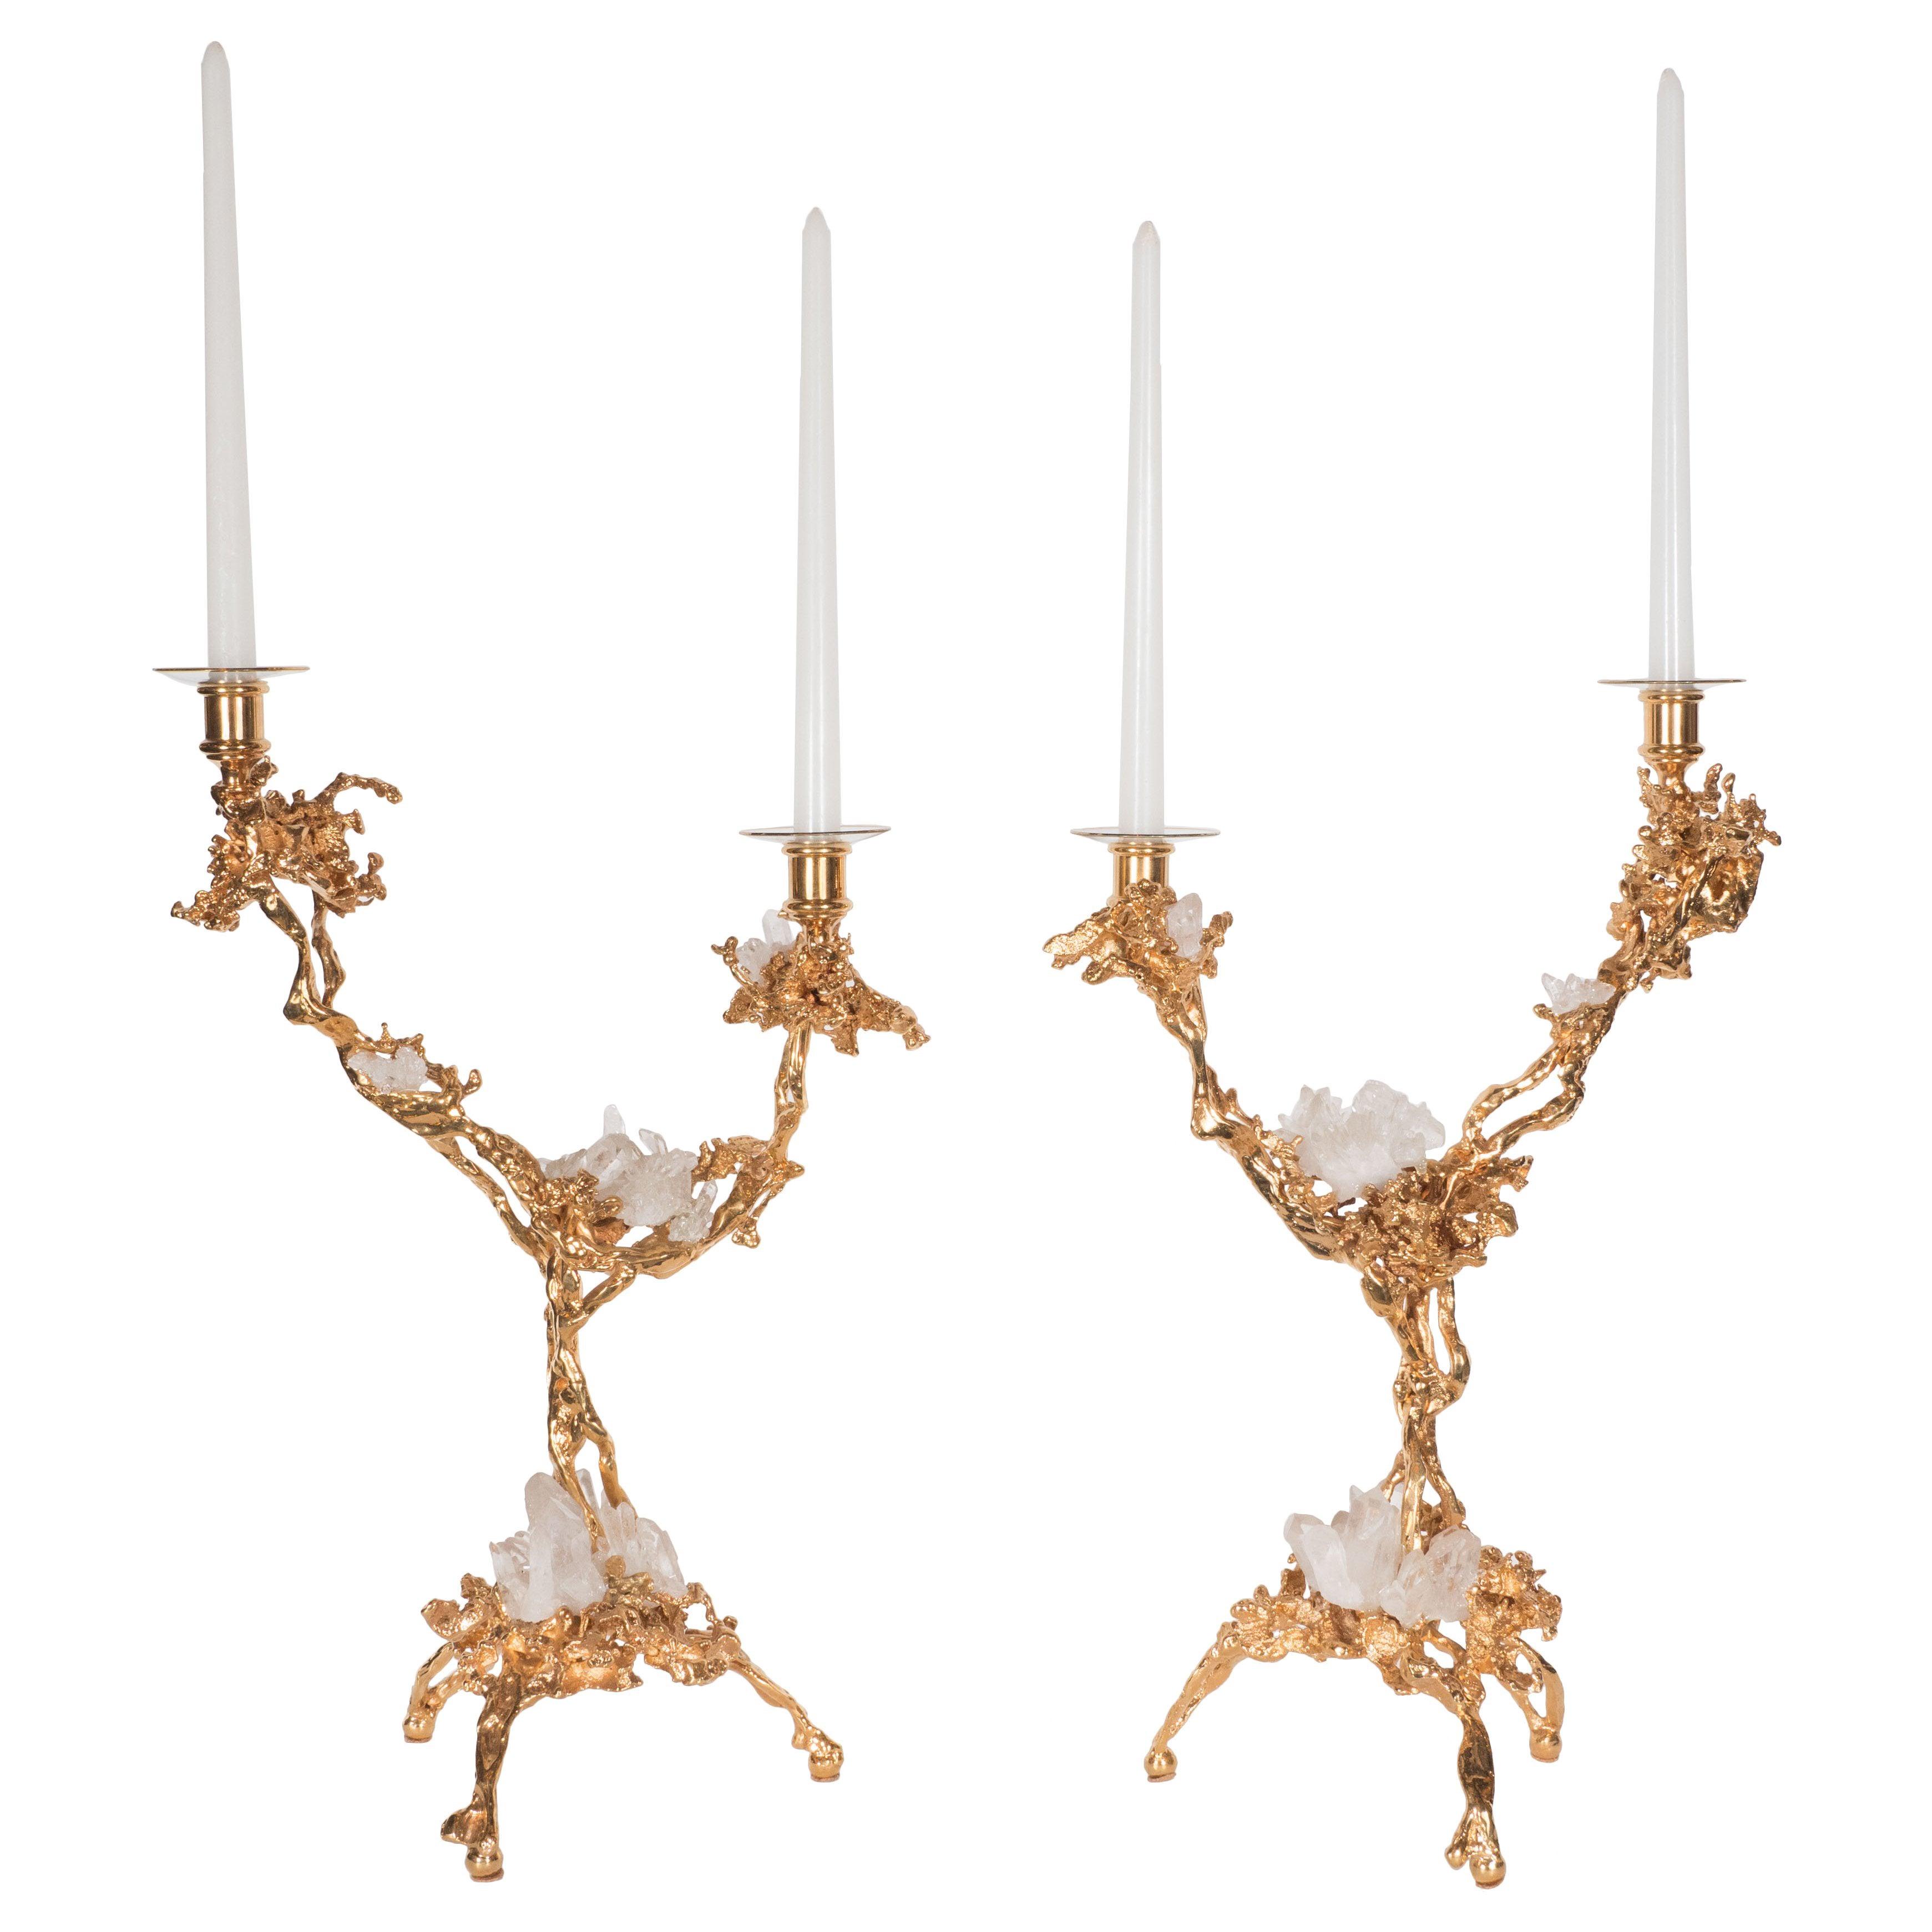 Pair of Double Branch 24-Karat Gold-Plated Bronze Candlesticks by Claude Boeltz